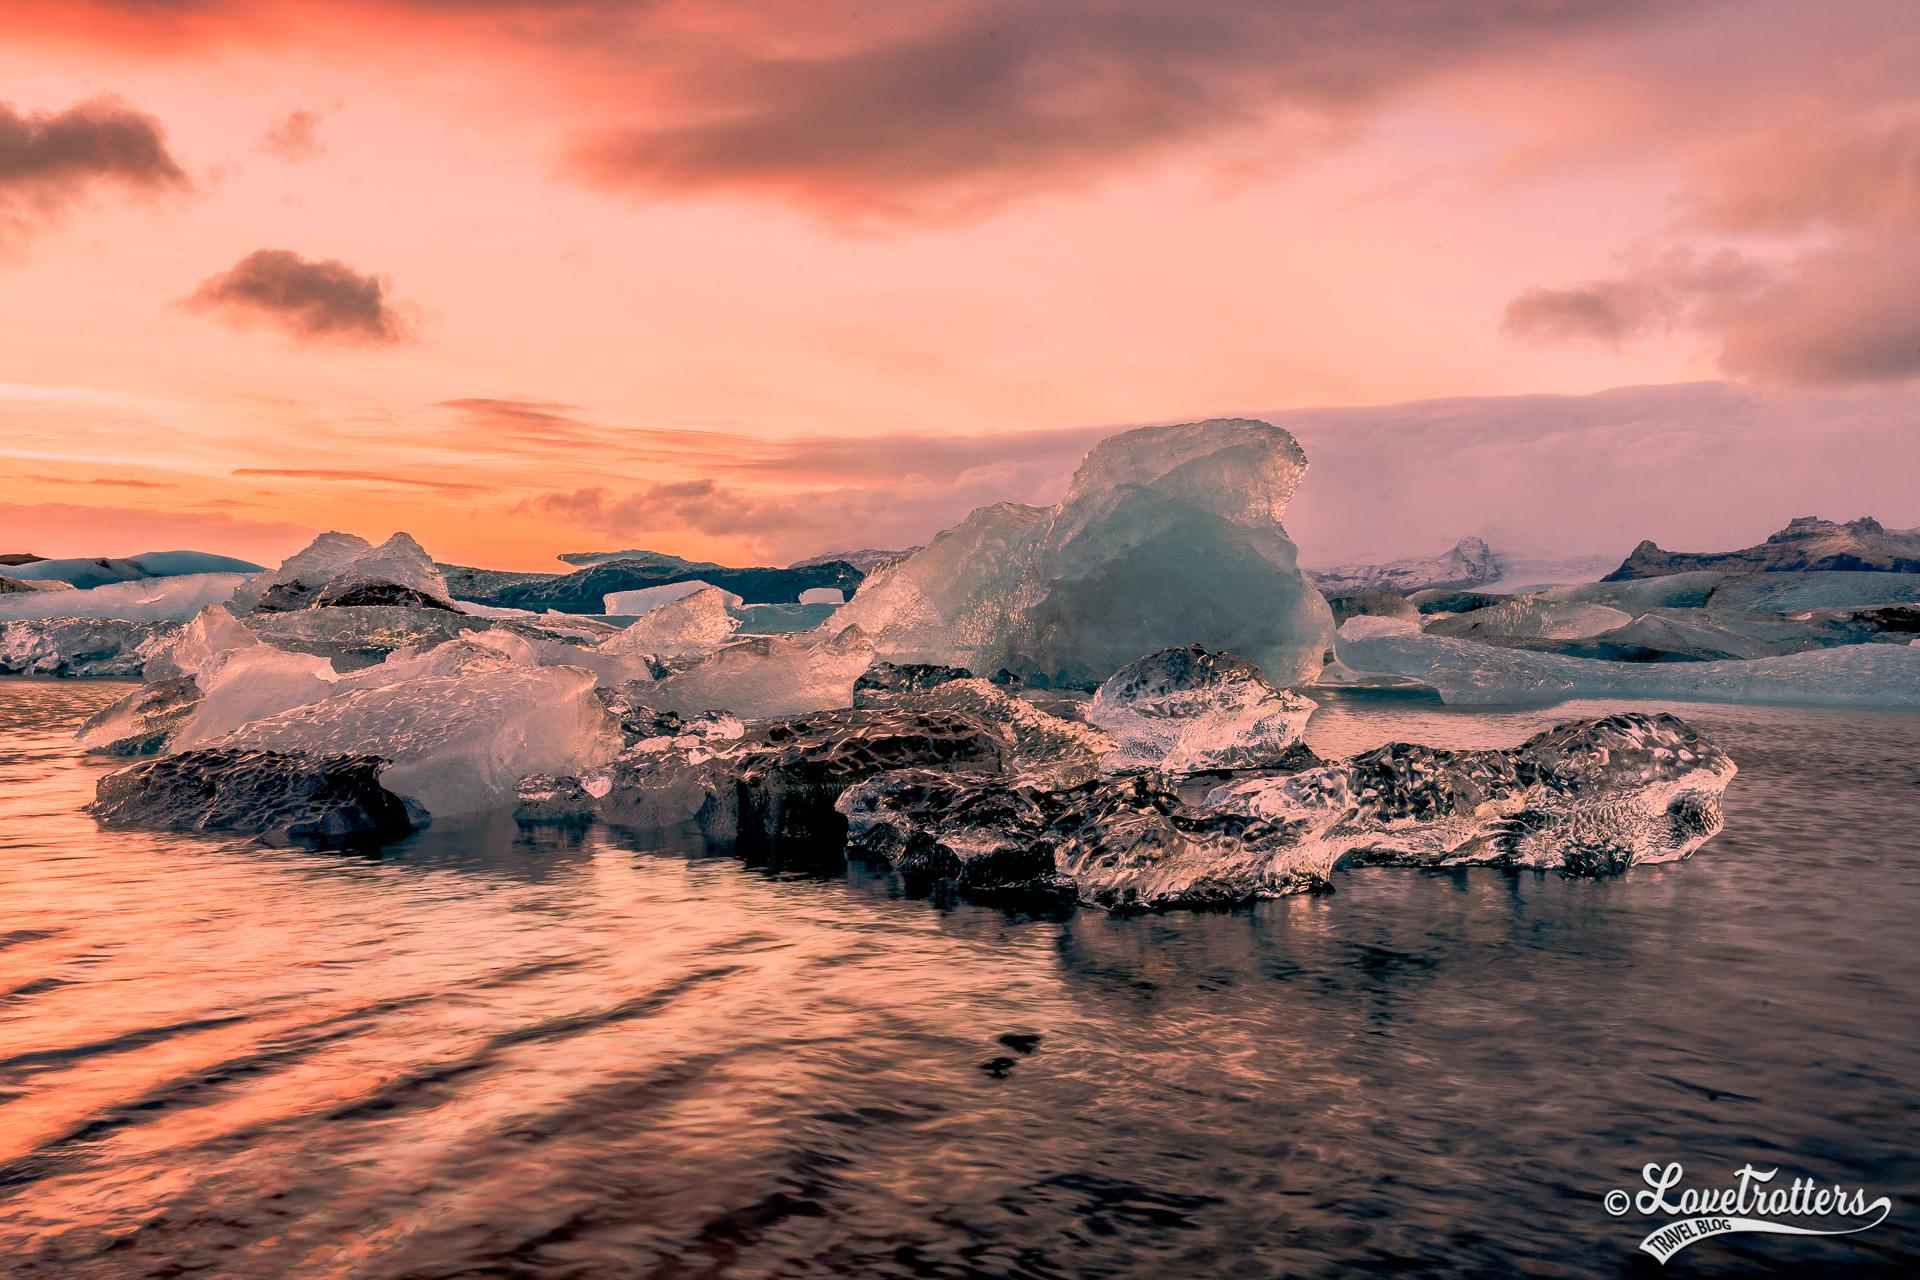 L la lagune glaciaire Jokulsarlon et la plage des diamants en Islande